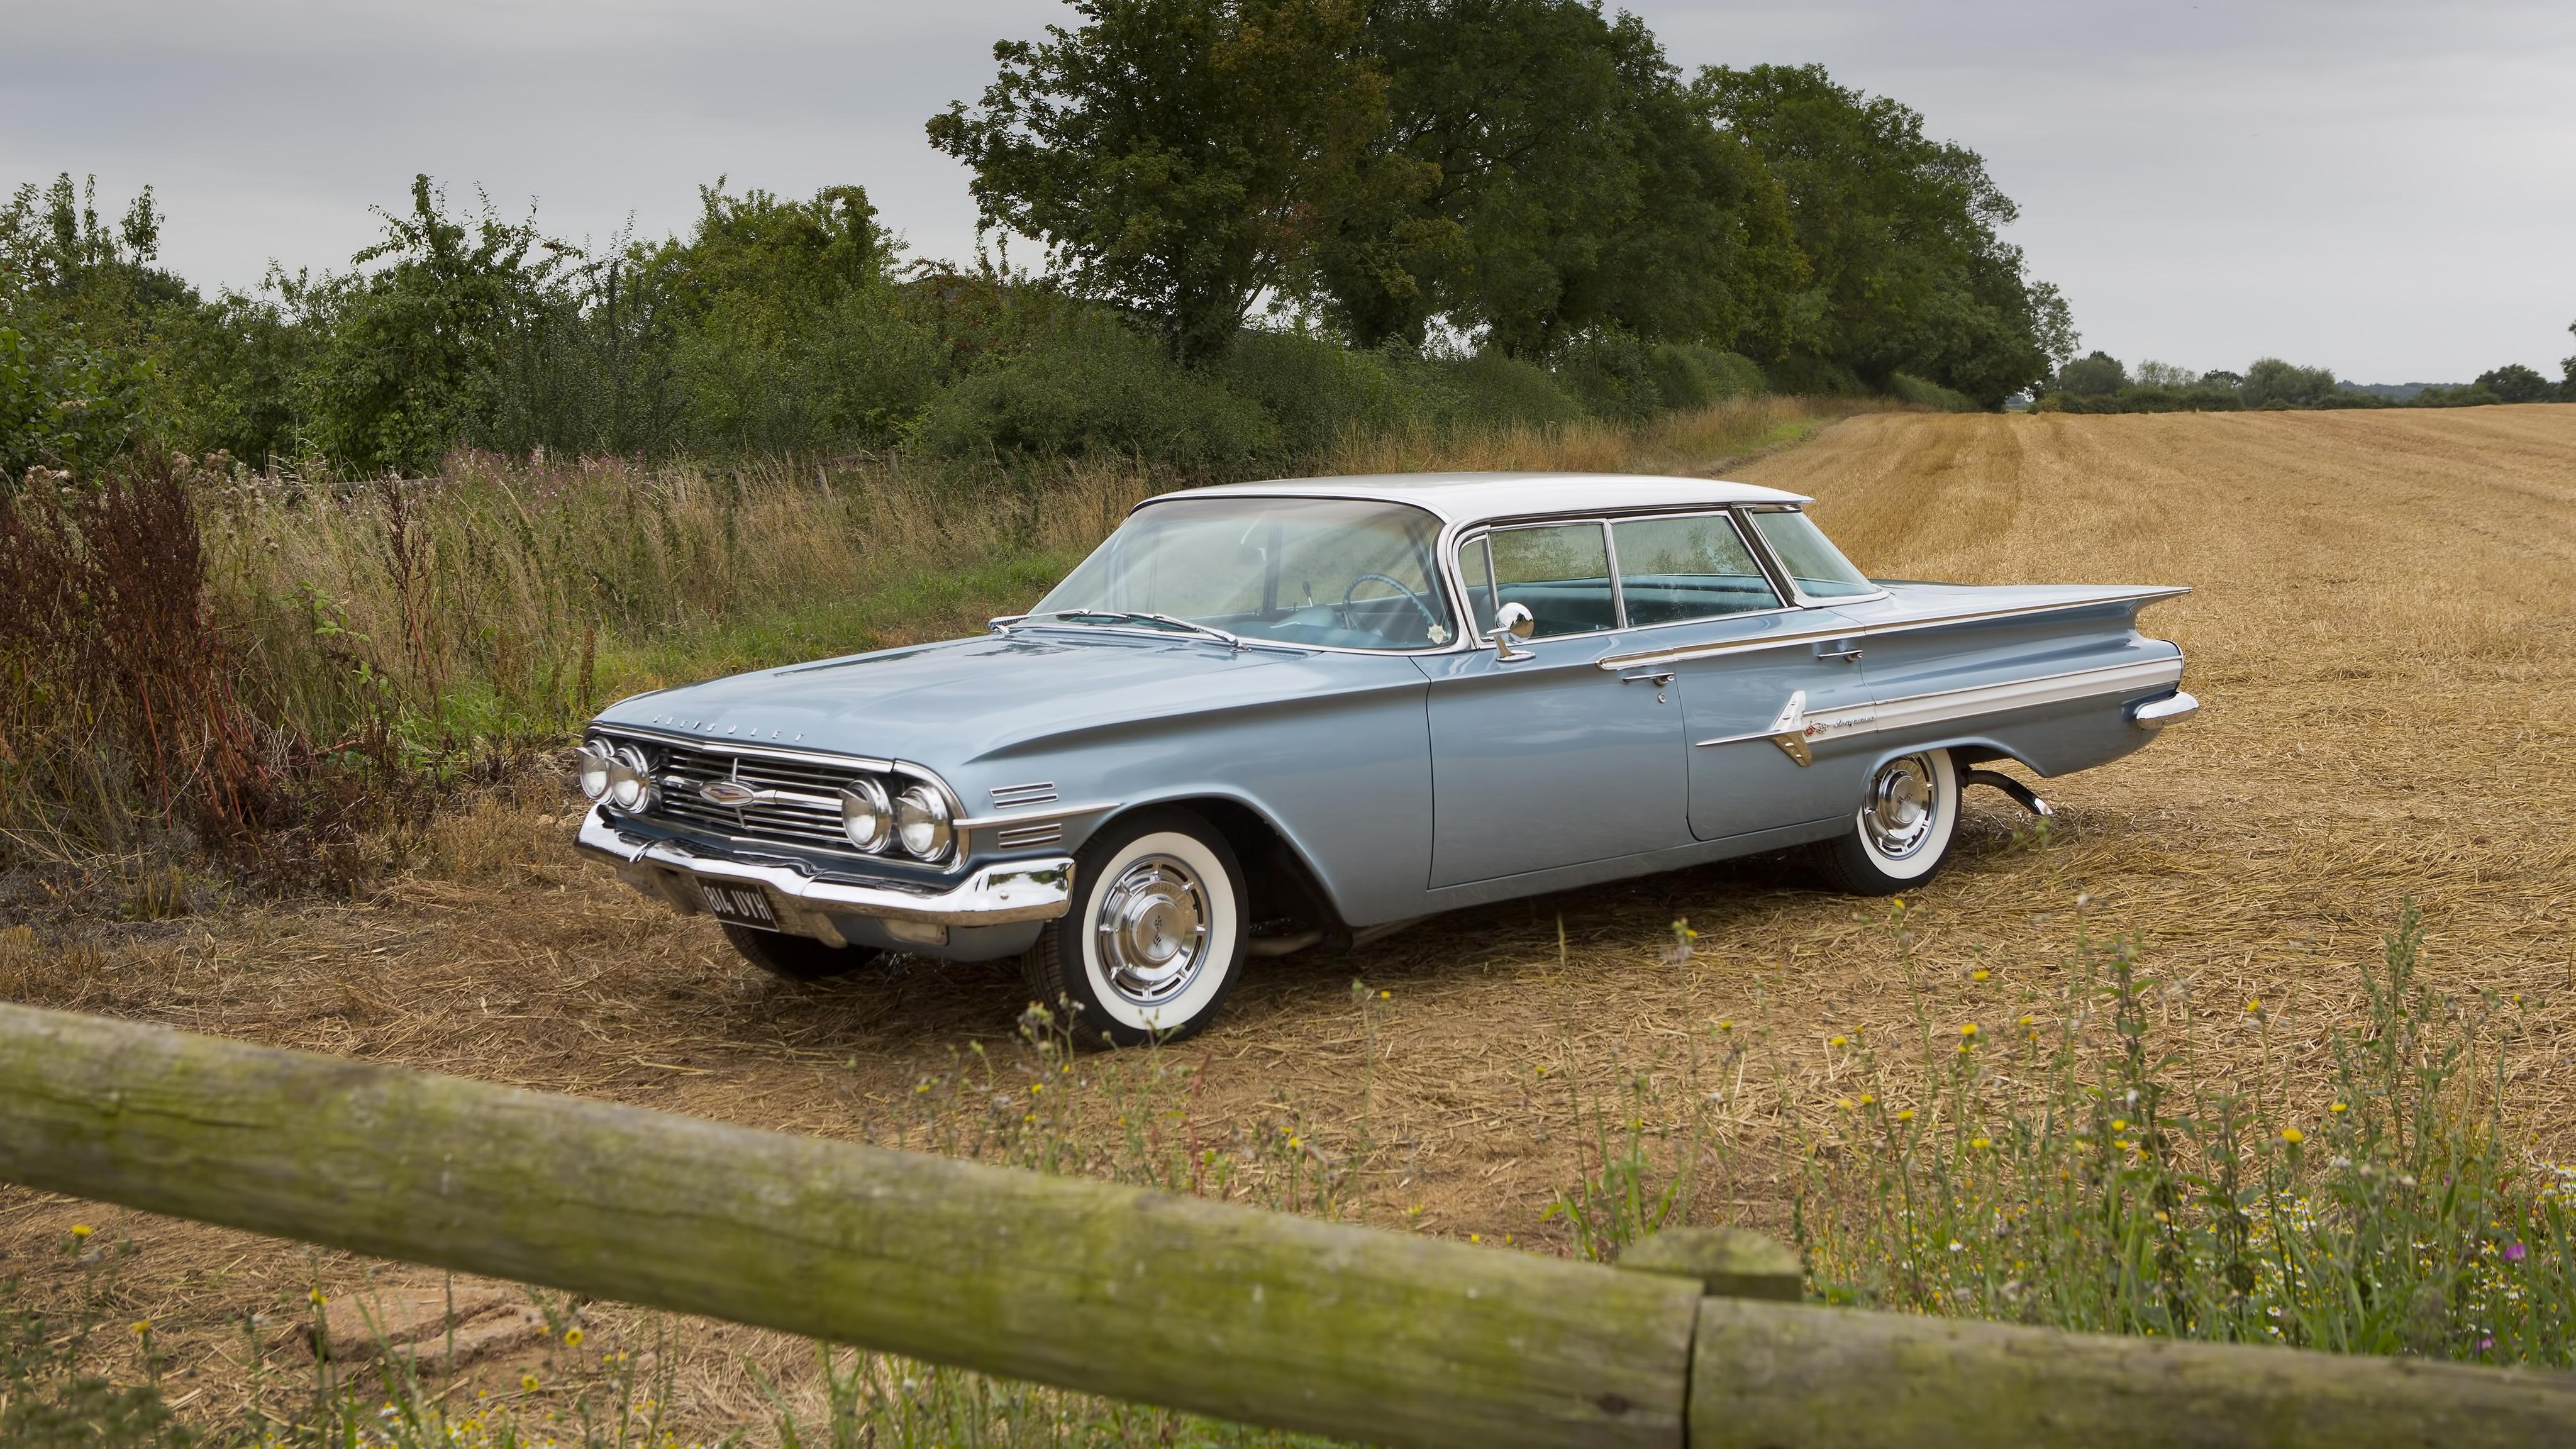 1960 chevrolet impala sport sedan classic wallpaper